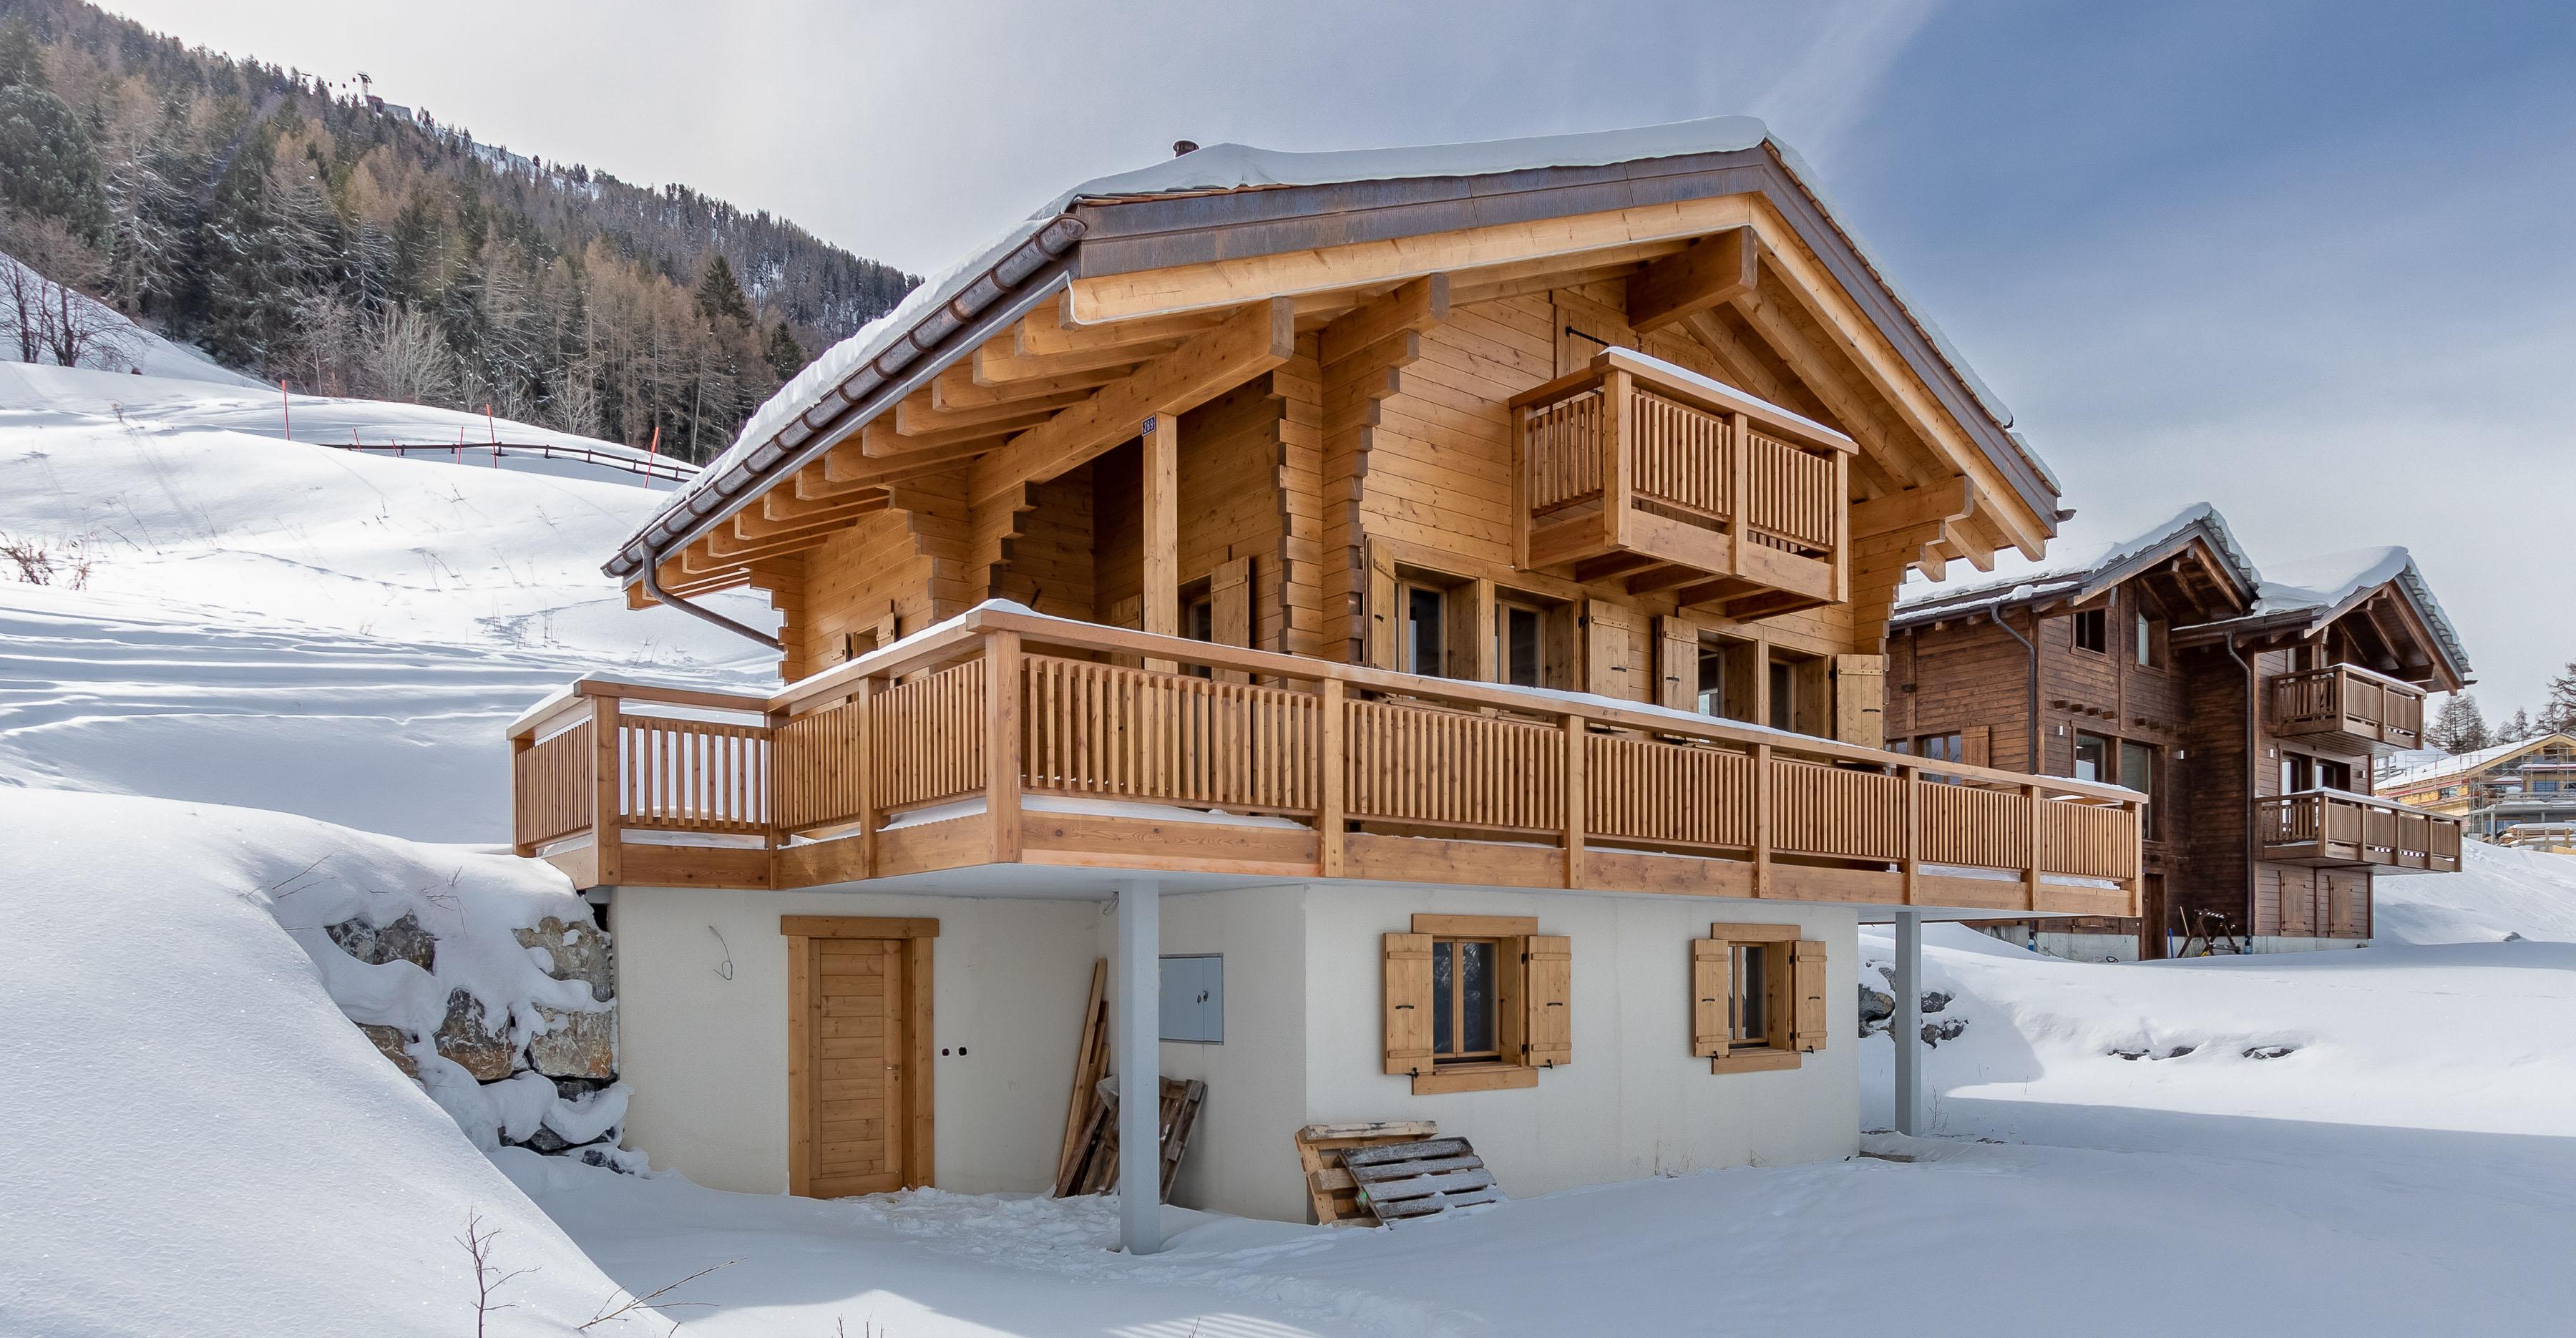 Chalet Les Cleves Chalet, Switzerland